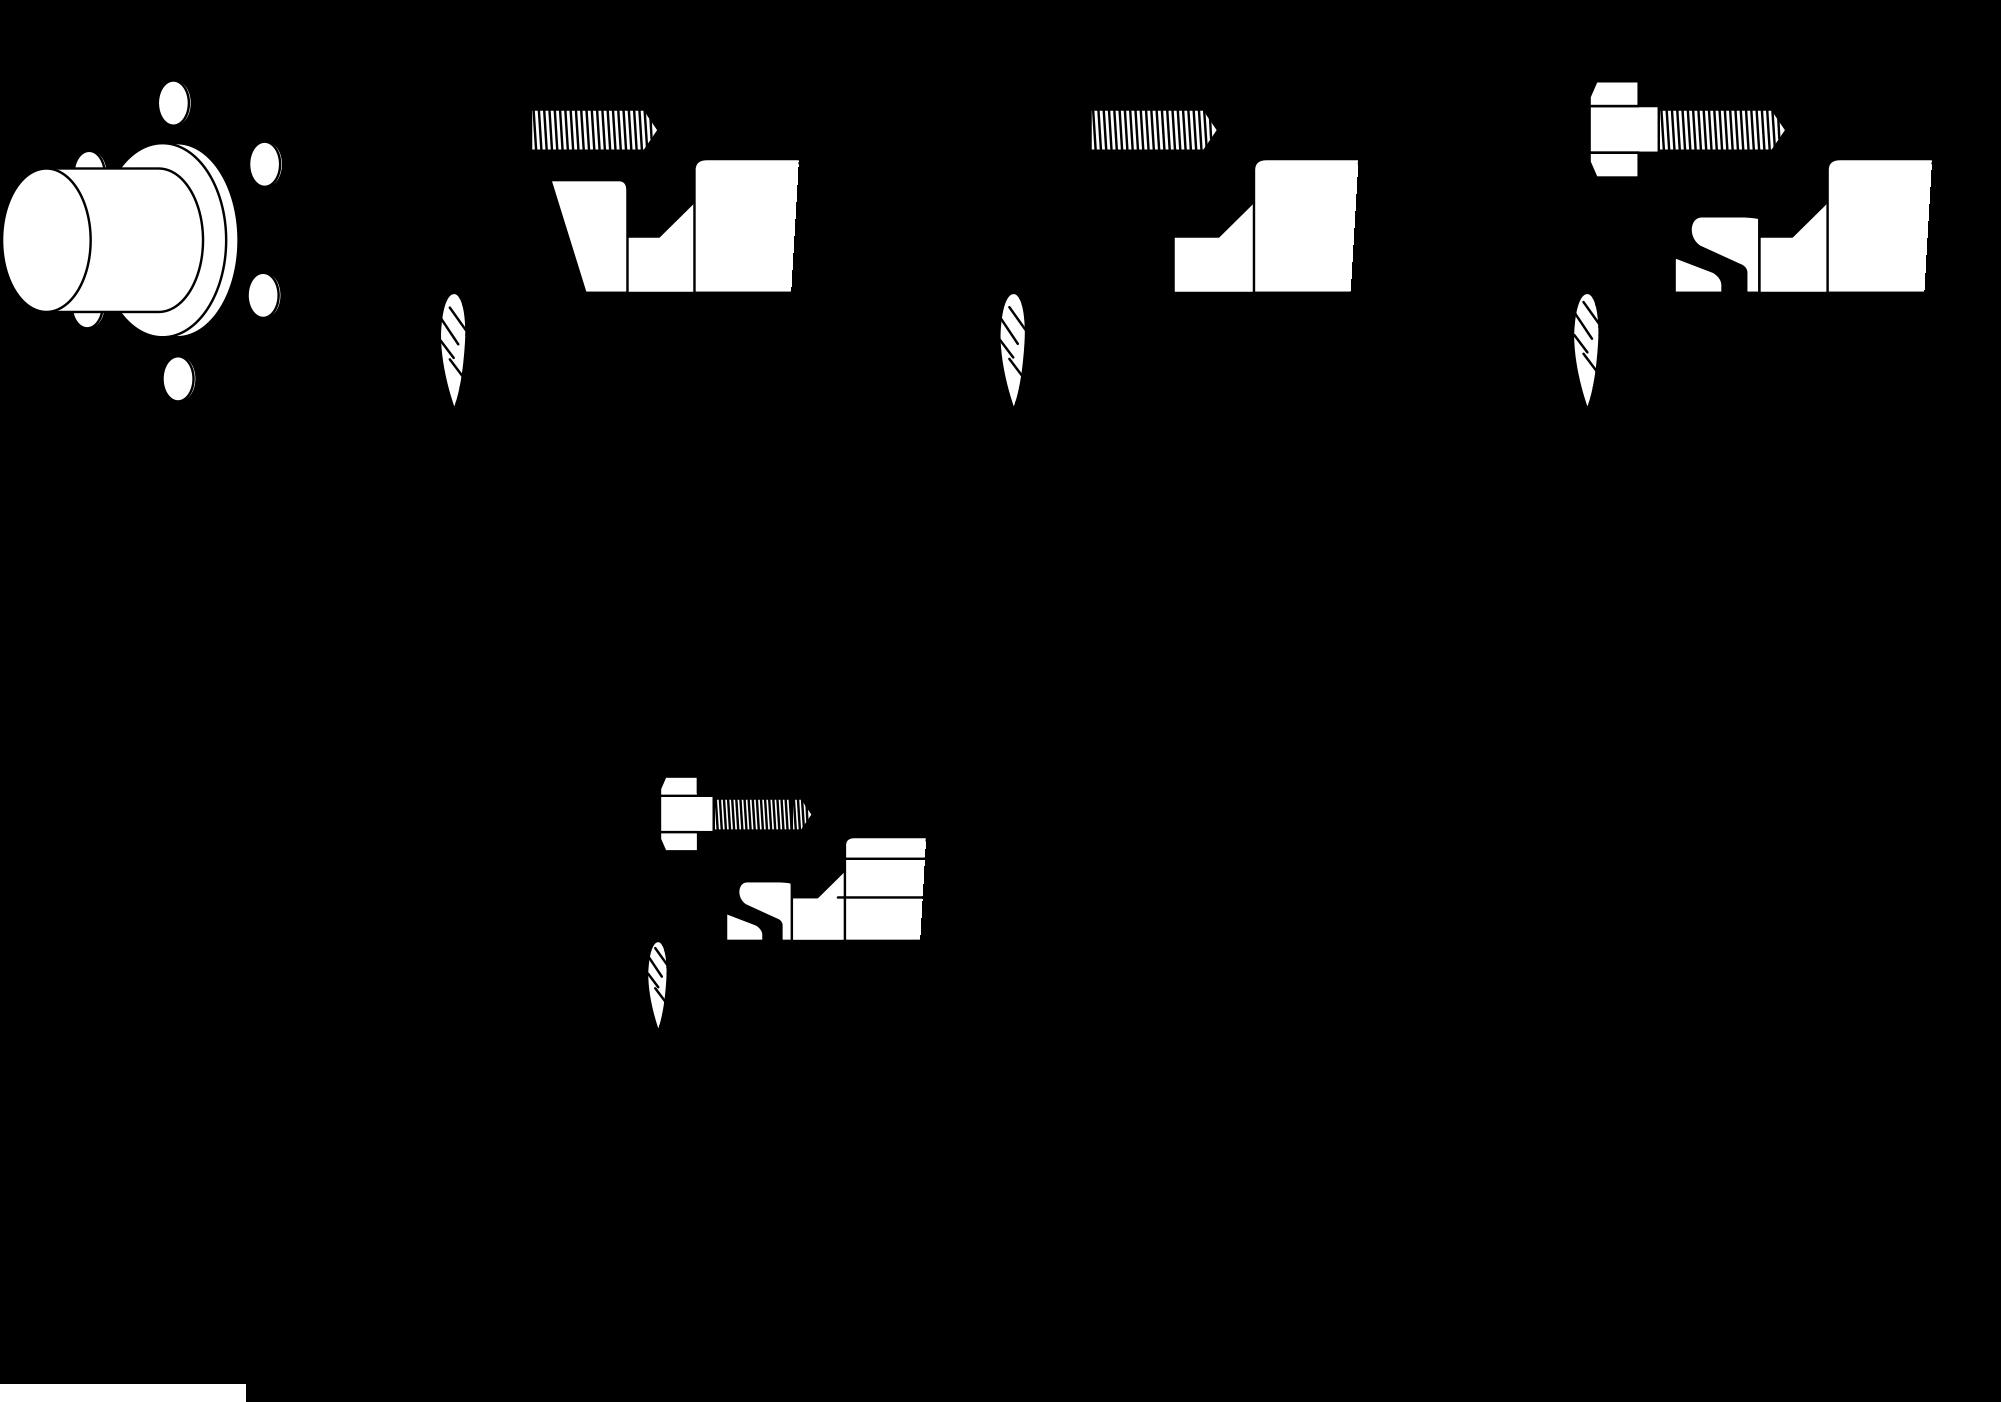 Tabela de Tolerâncias para Retentores sem Anel Metálico